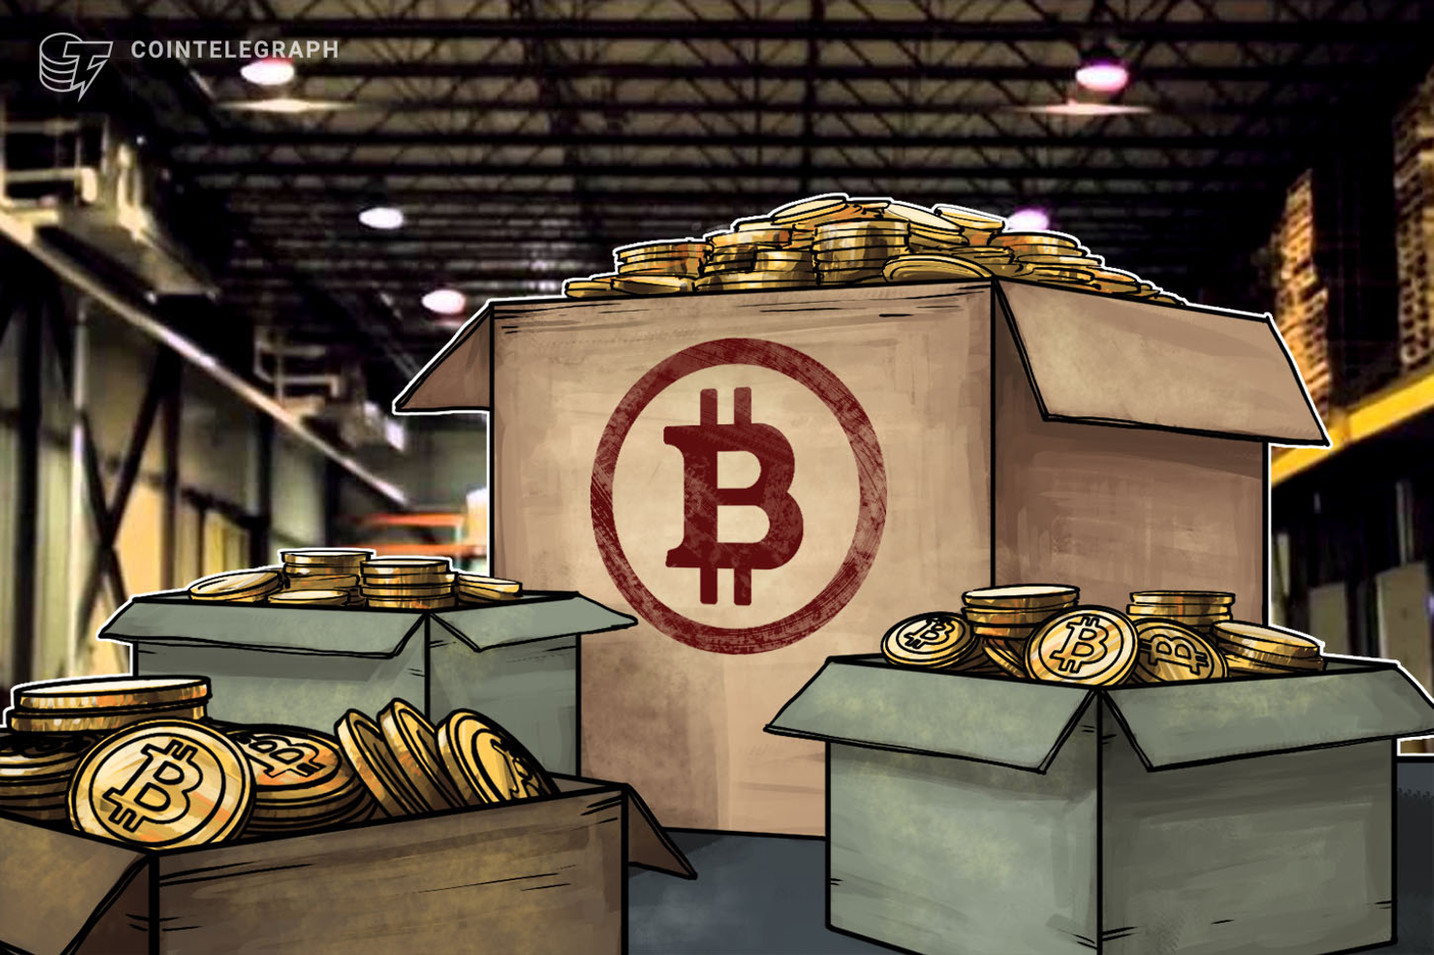 Transferencia del 5% del total de Bitcoins en un solo bloque rompe el récord histórico